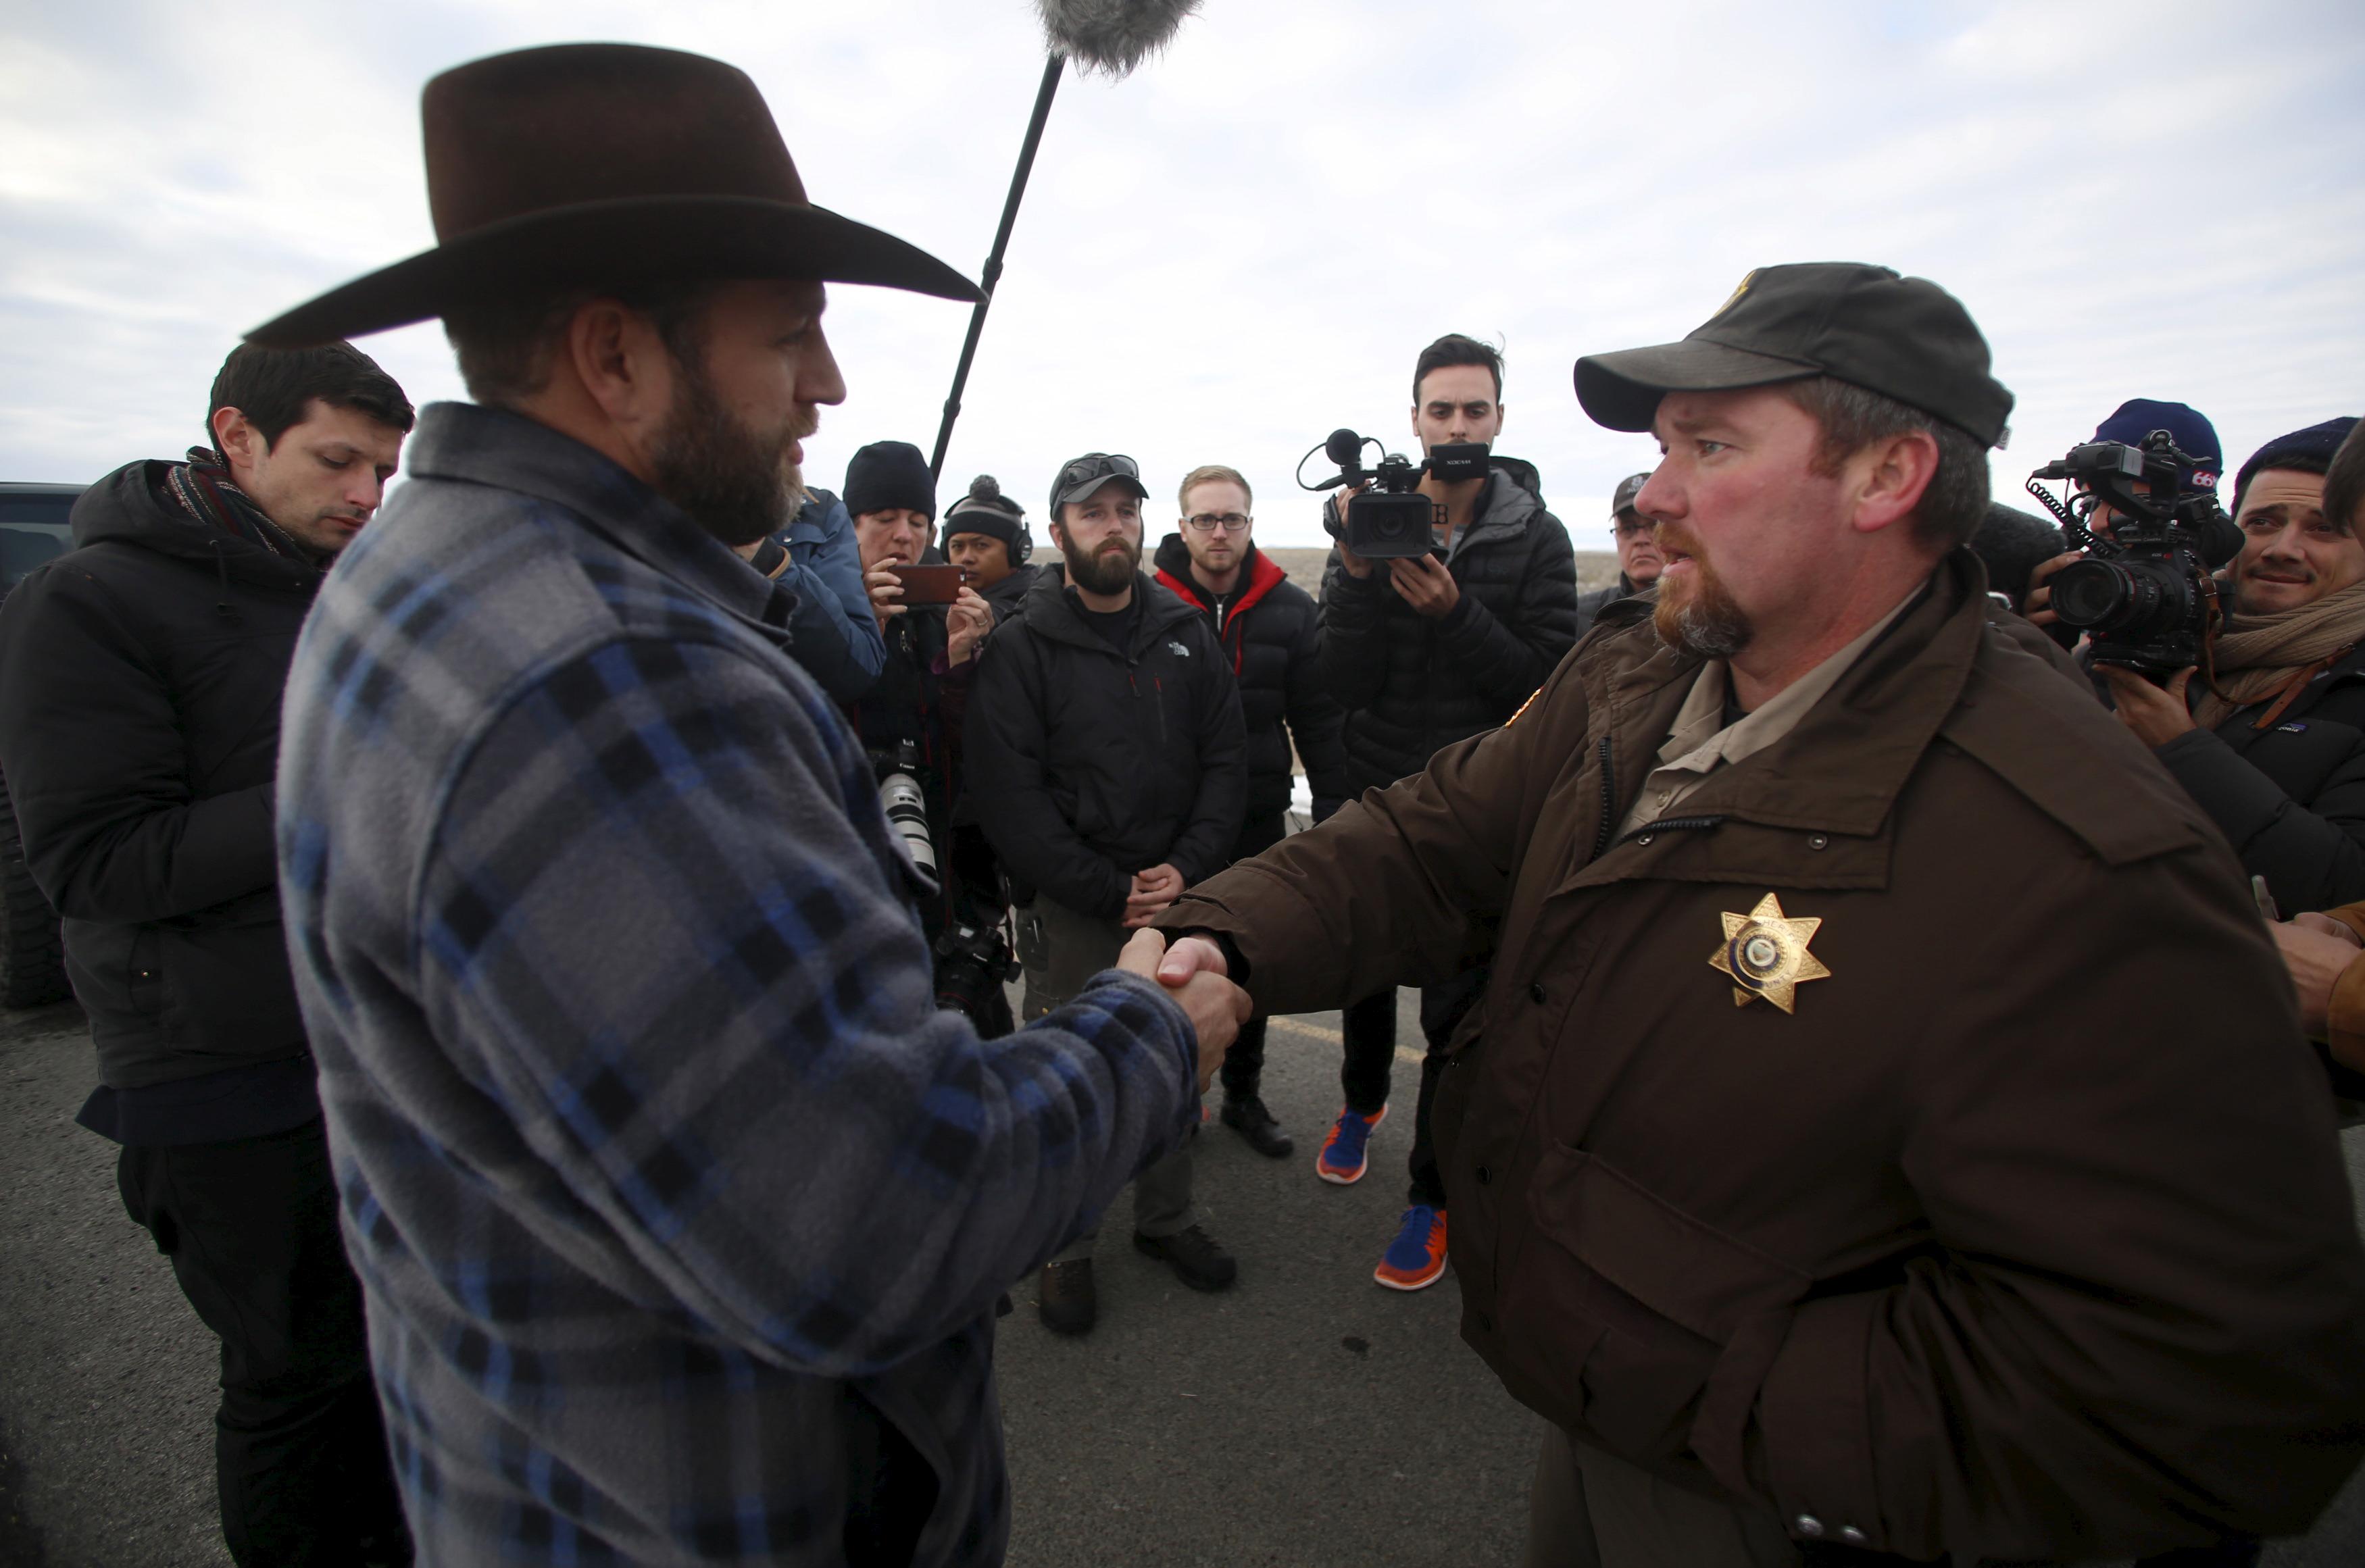 Ammon Bundy meets with Harney County Sheriff David Ward along a road south of the Malheur National Wildlife Refuge near Burns, Oregon, Jan. 7, 2016.